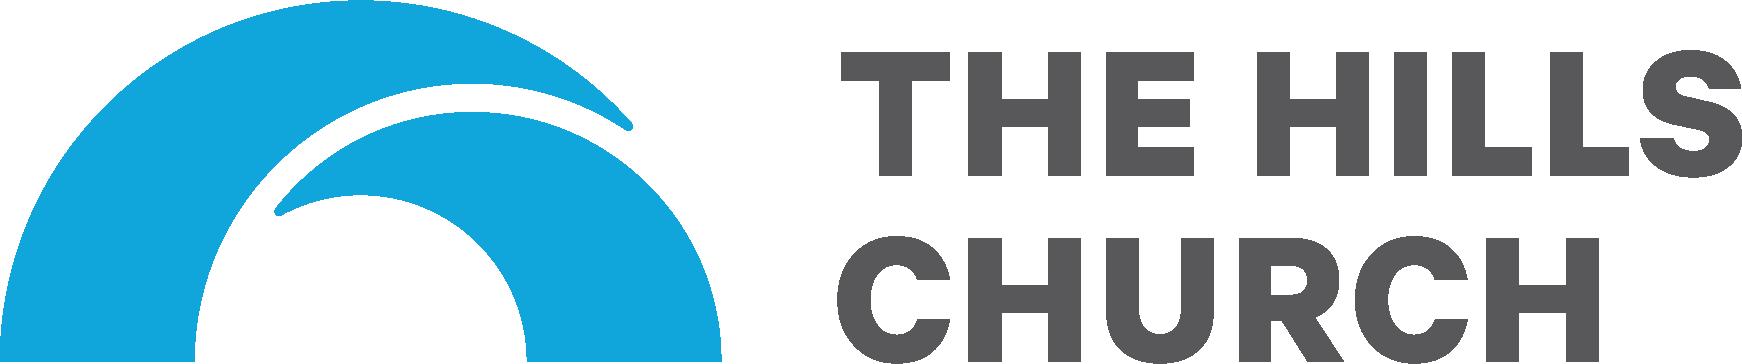 The Hills Church Online Campus